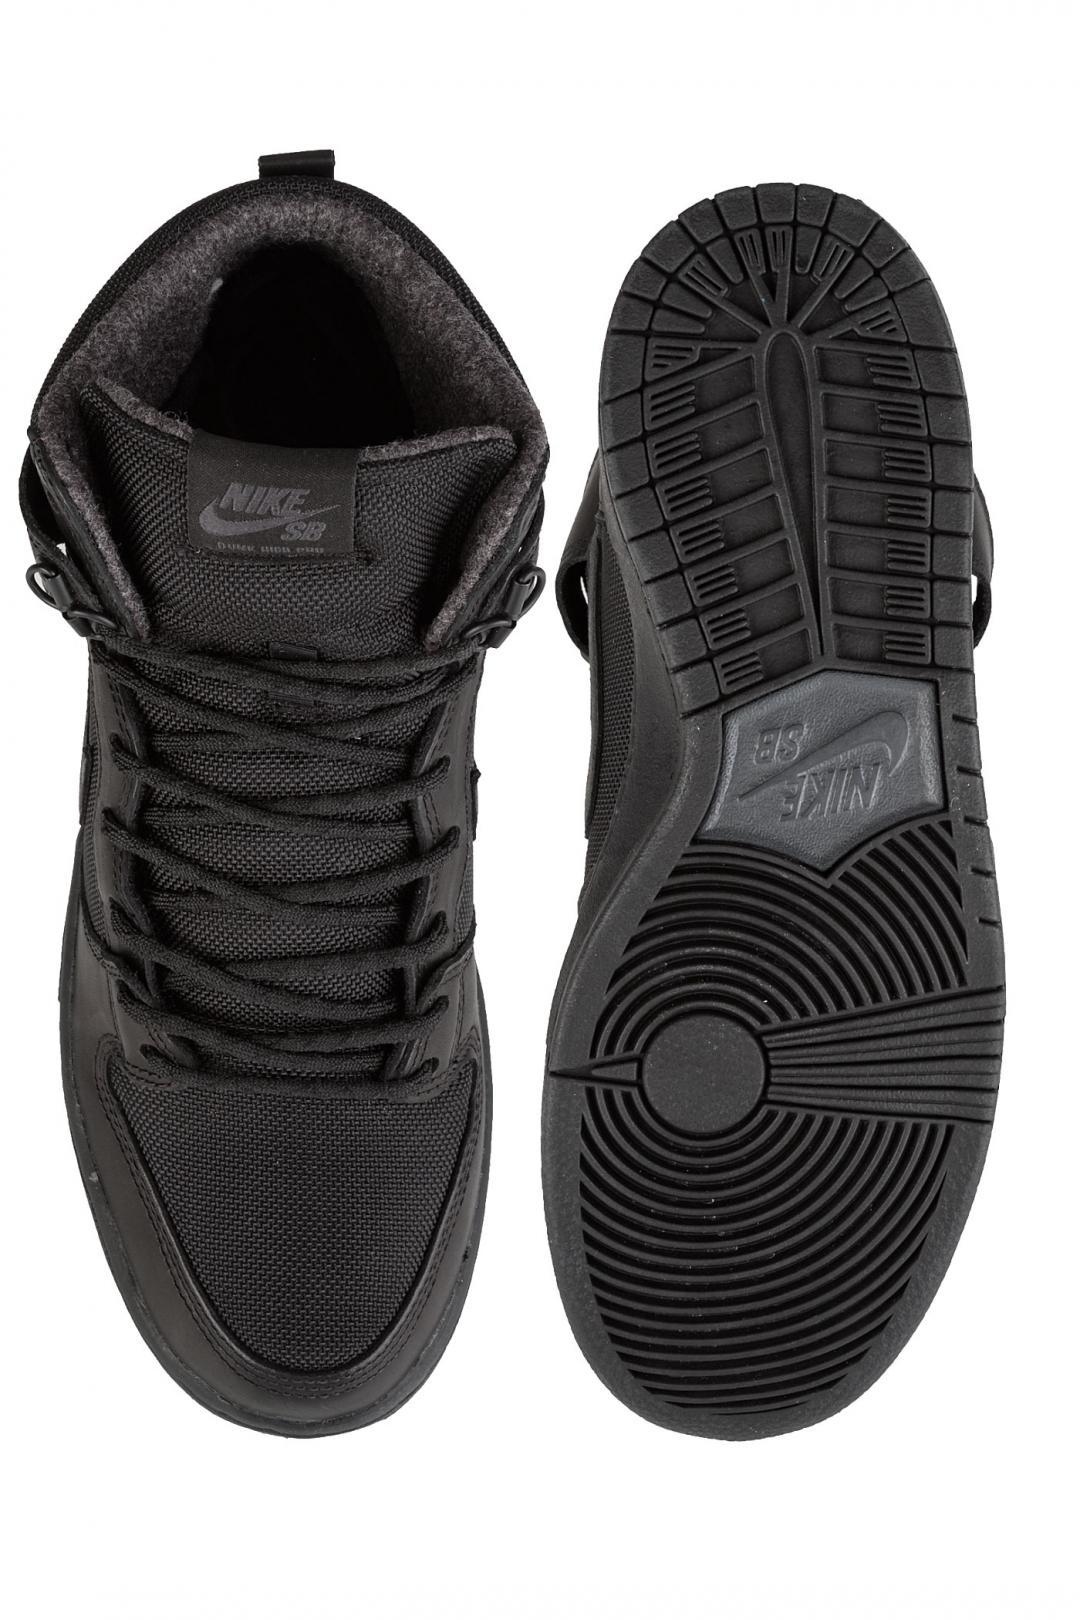 Uomo Nike SB Dunk Hi Pro Bota black black   Sneakers high top